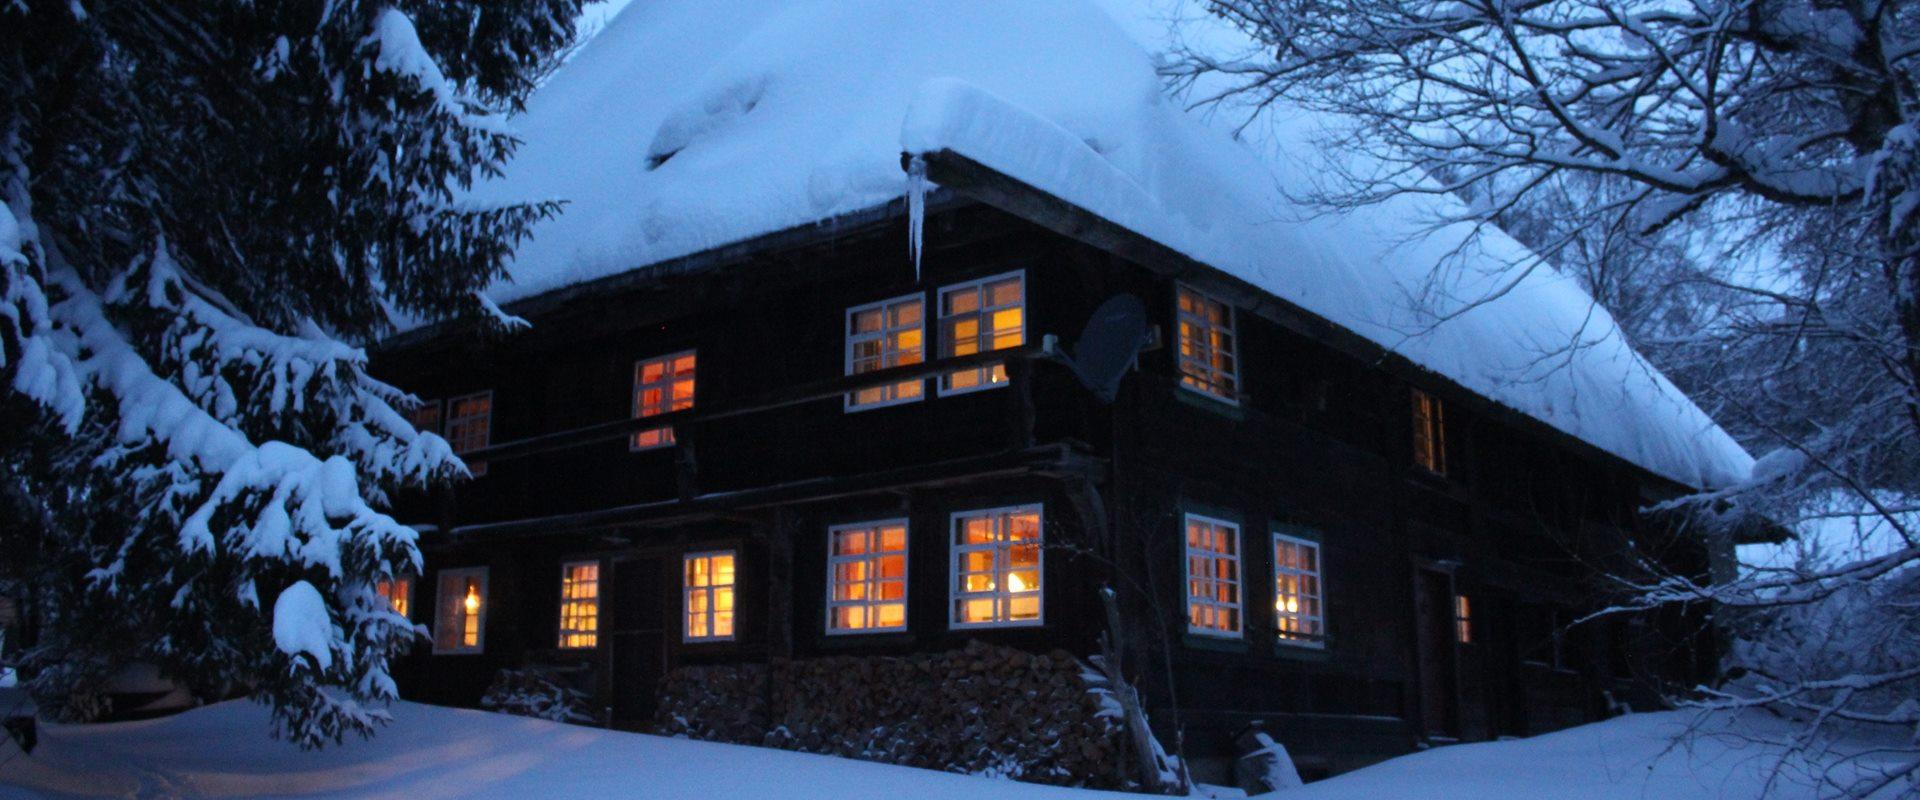 Ferienhaus nachts beleuchtet im Winter / Griesbachhof-Schwarzwald